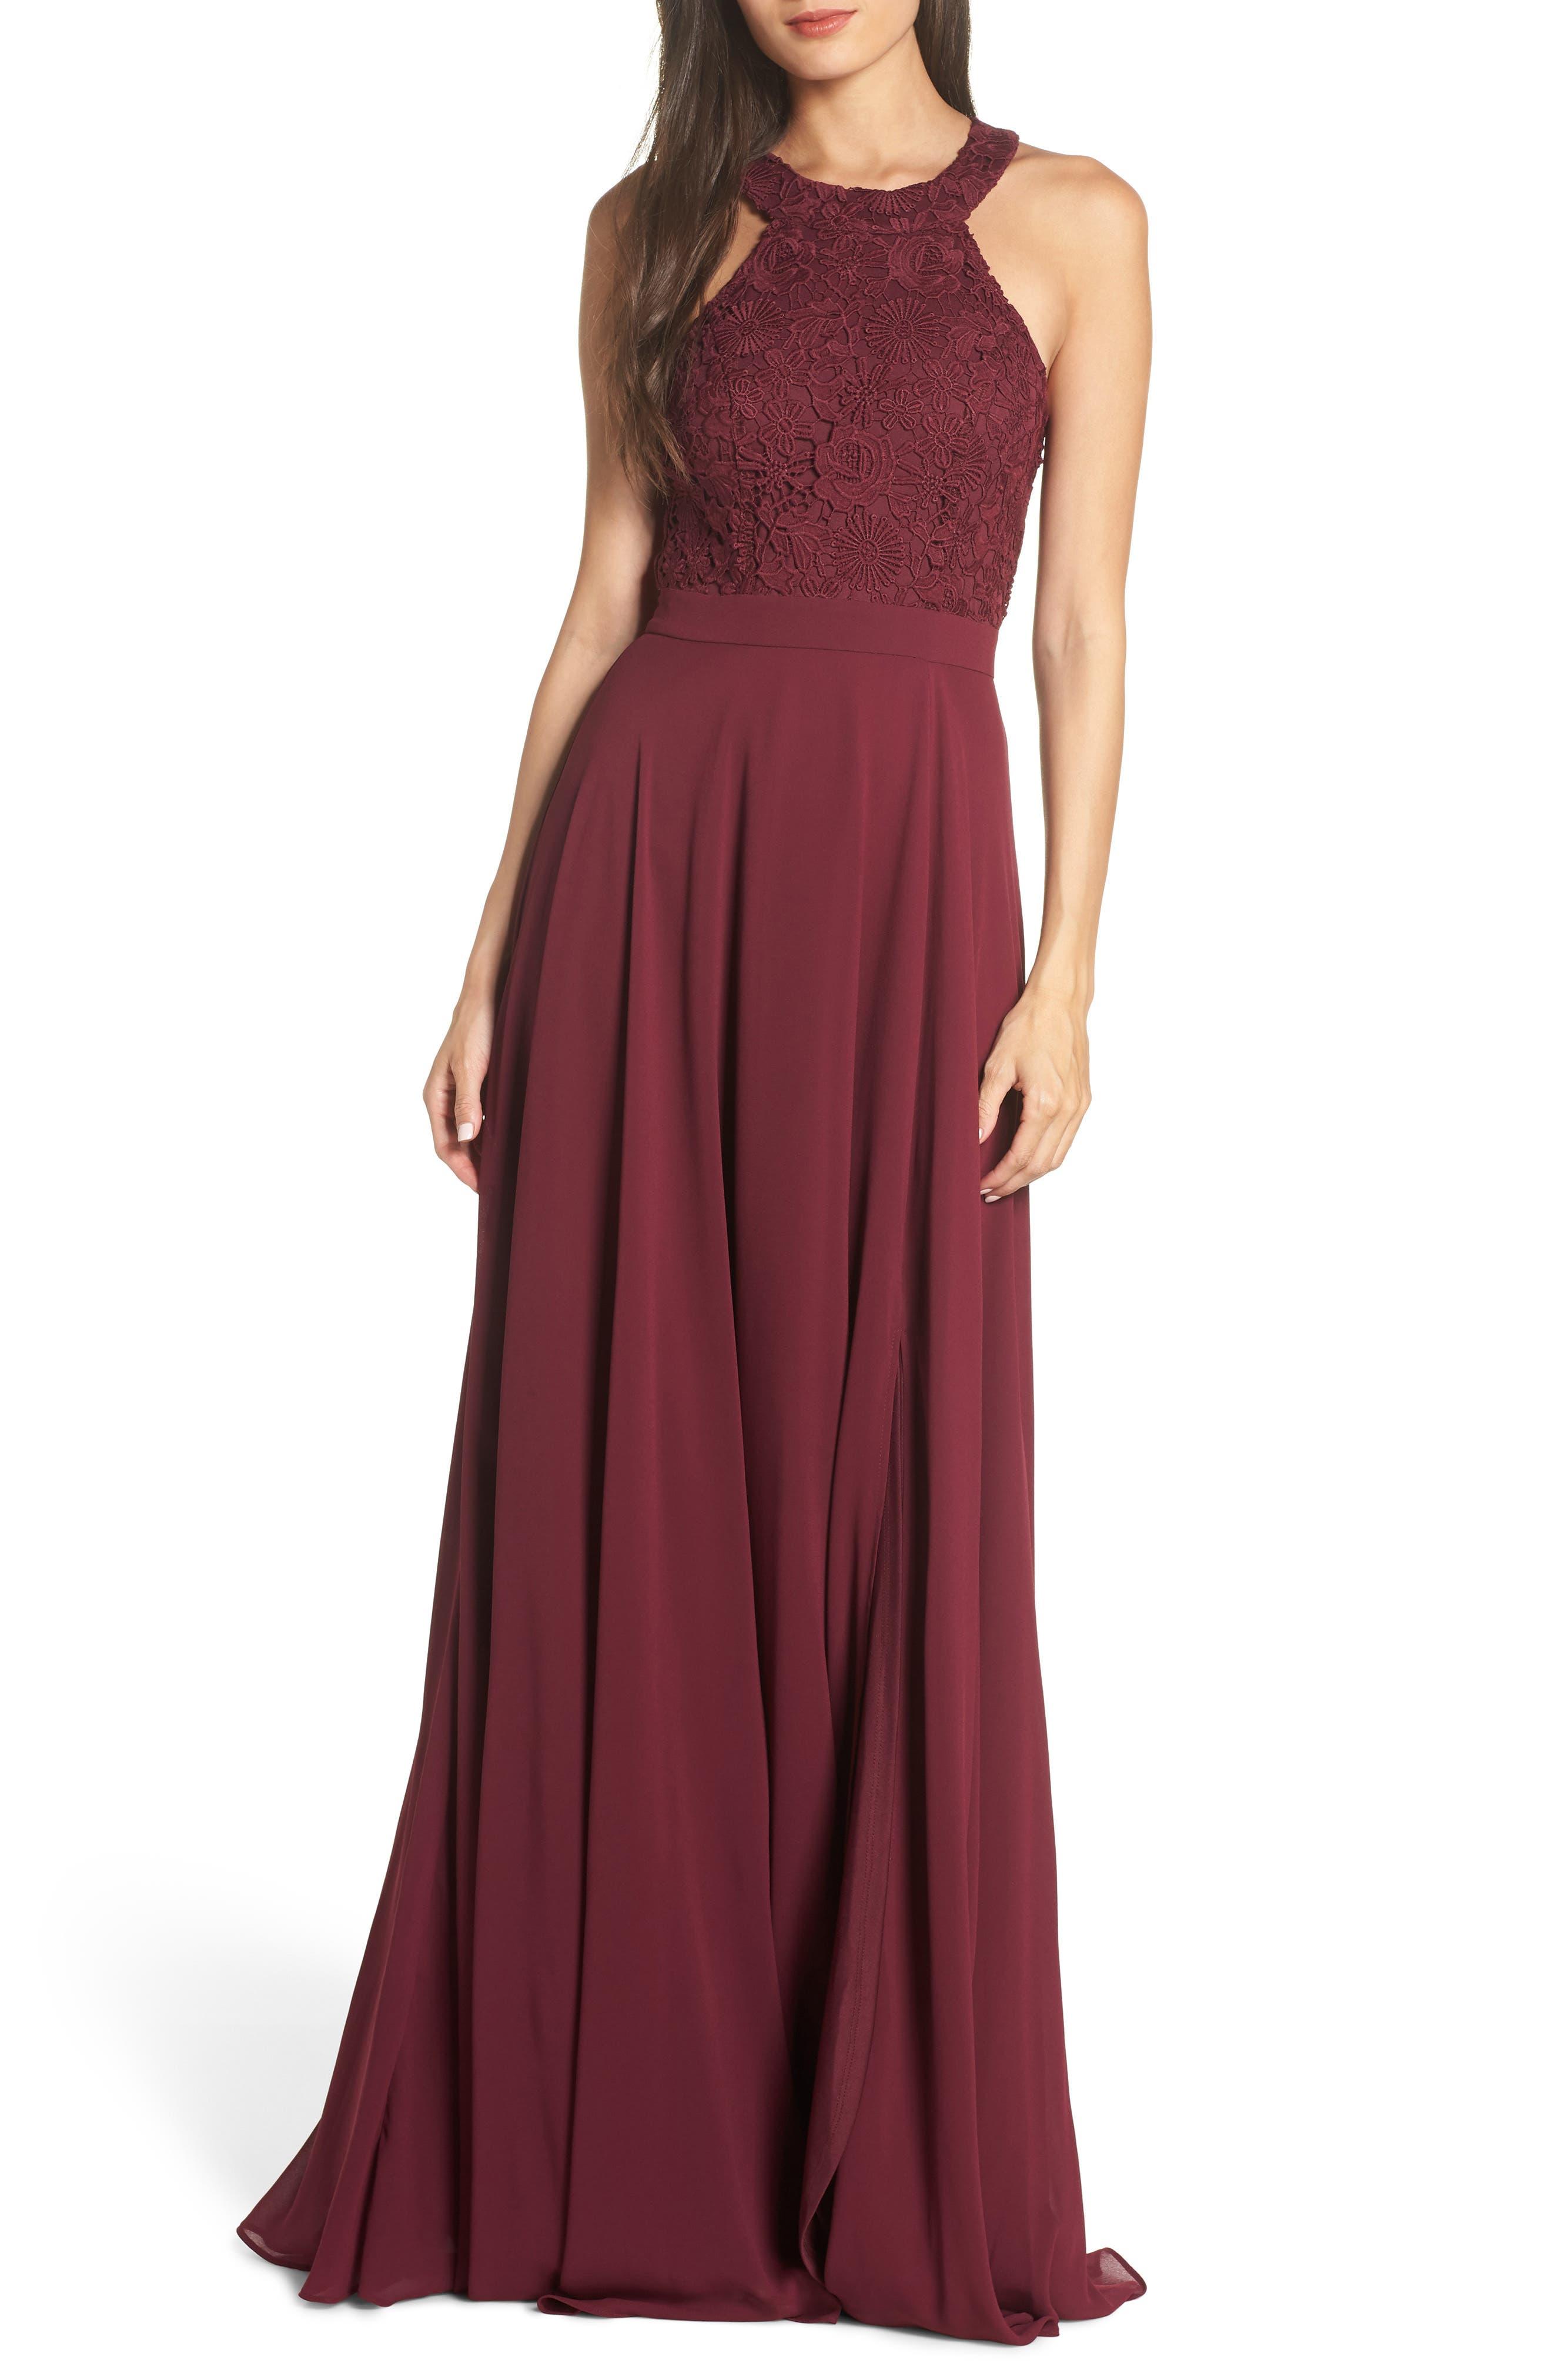 Halter Prom Dress